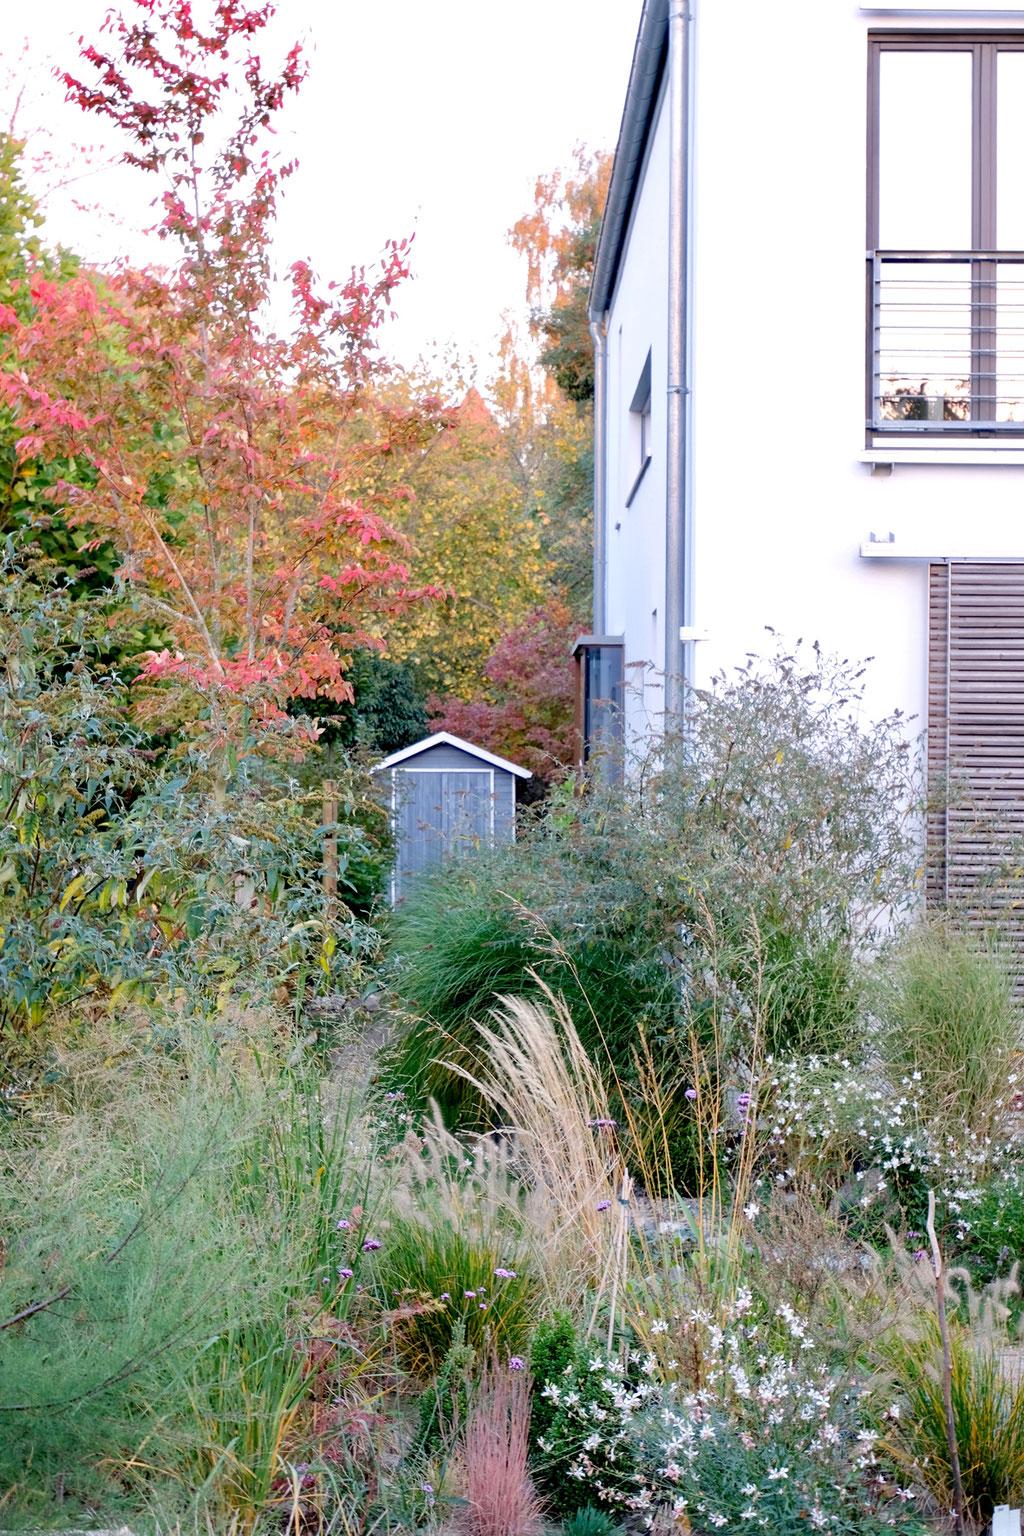 dieartigeGARTEN - Oktobergarten | Felsenbirne mit Blick die Nordseite entlang